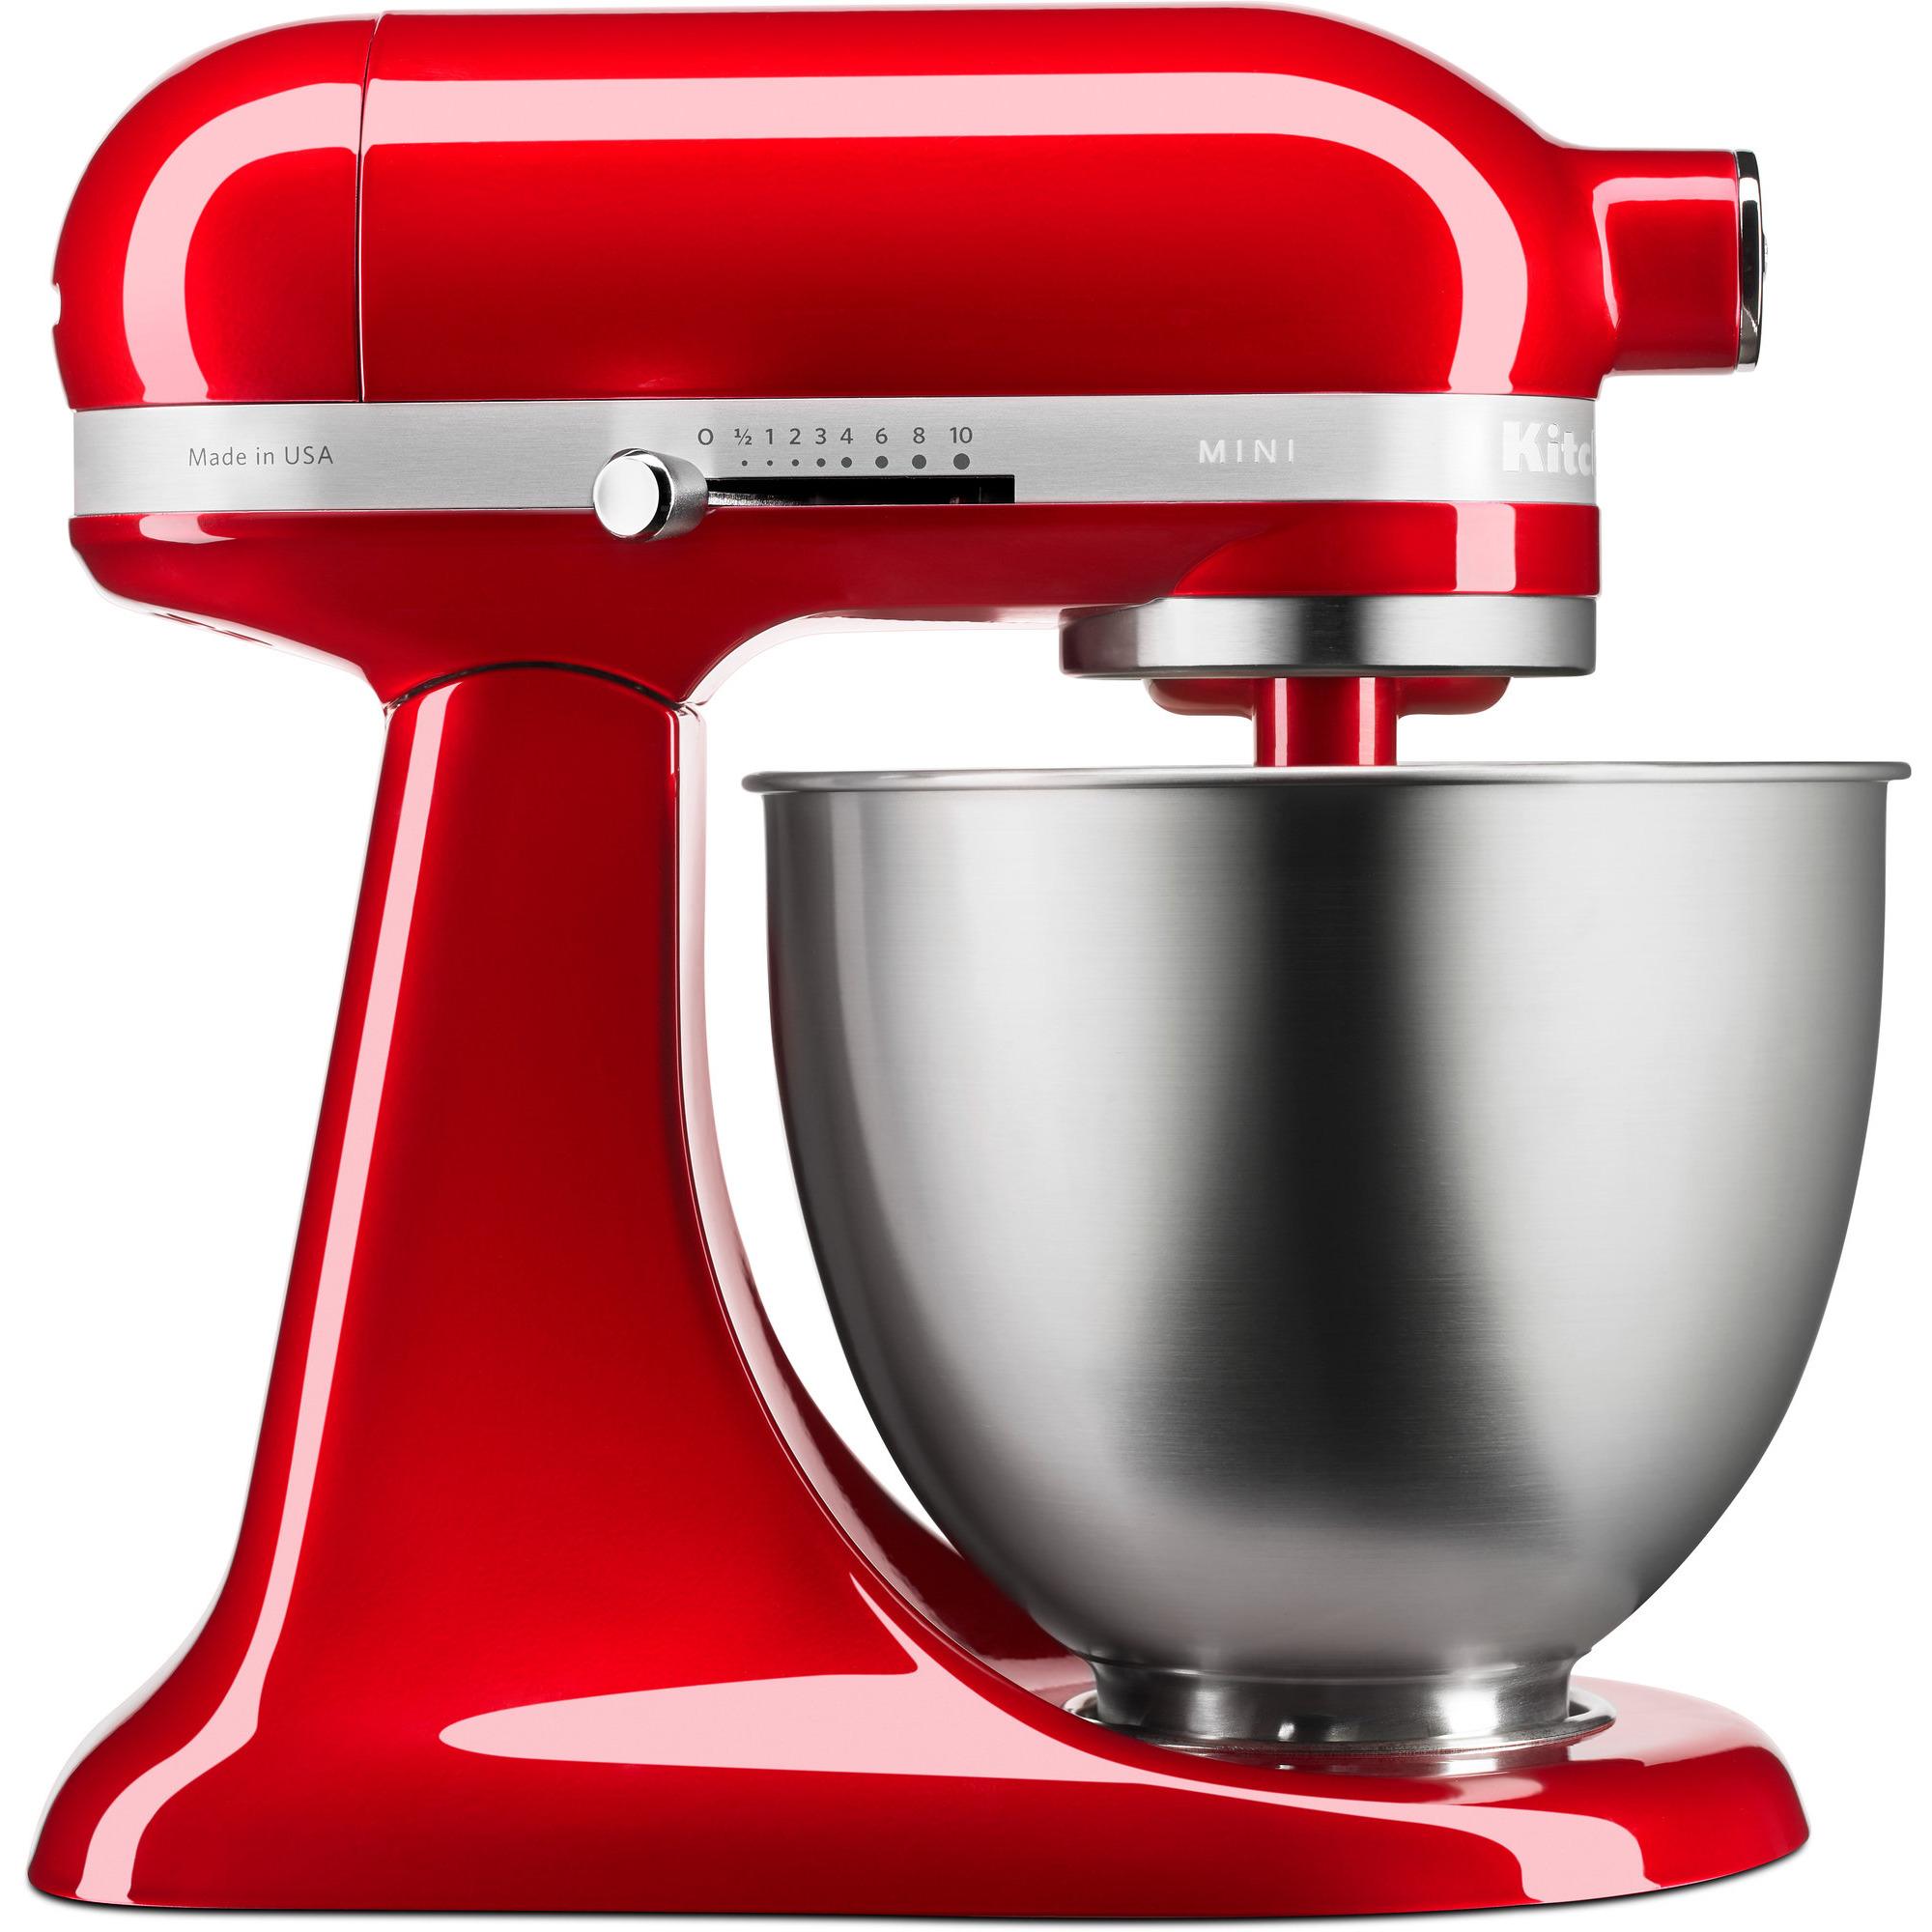 KitchenAid Artisan Stand Mixer Mini 33 L Apple Red